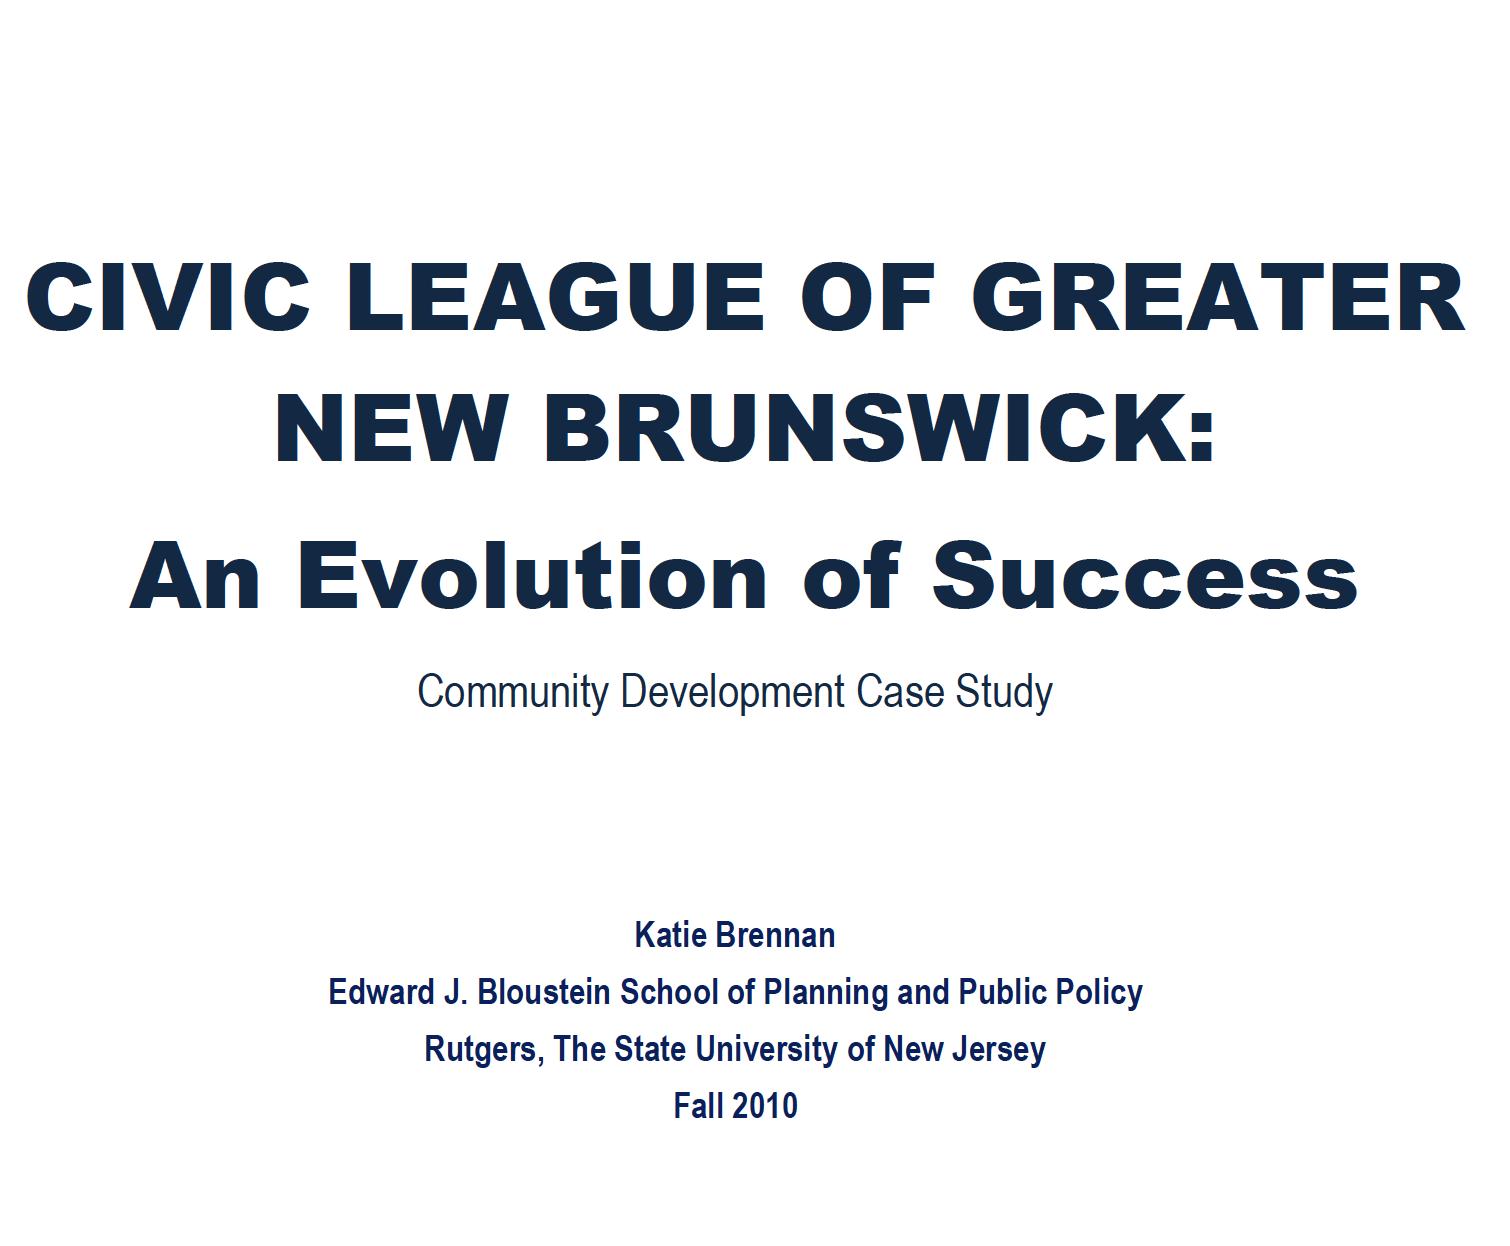 civic league New Brunswick Rutgers Bloustein engagement Voorhees